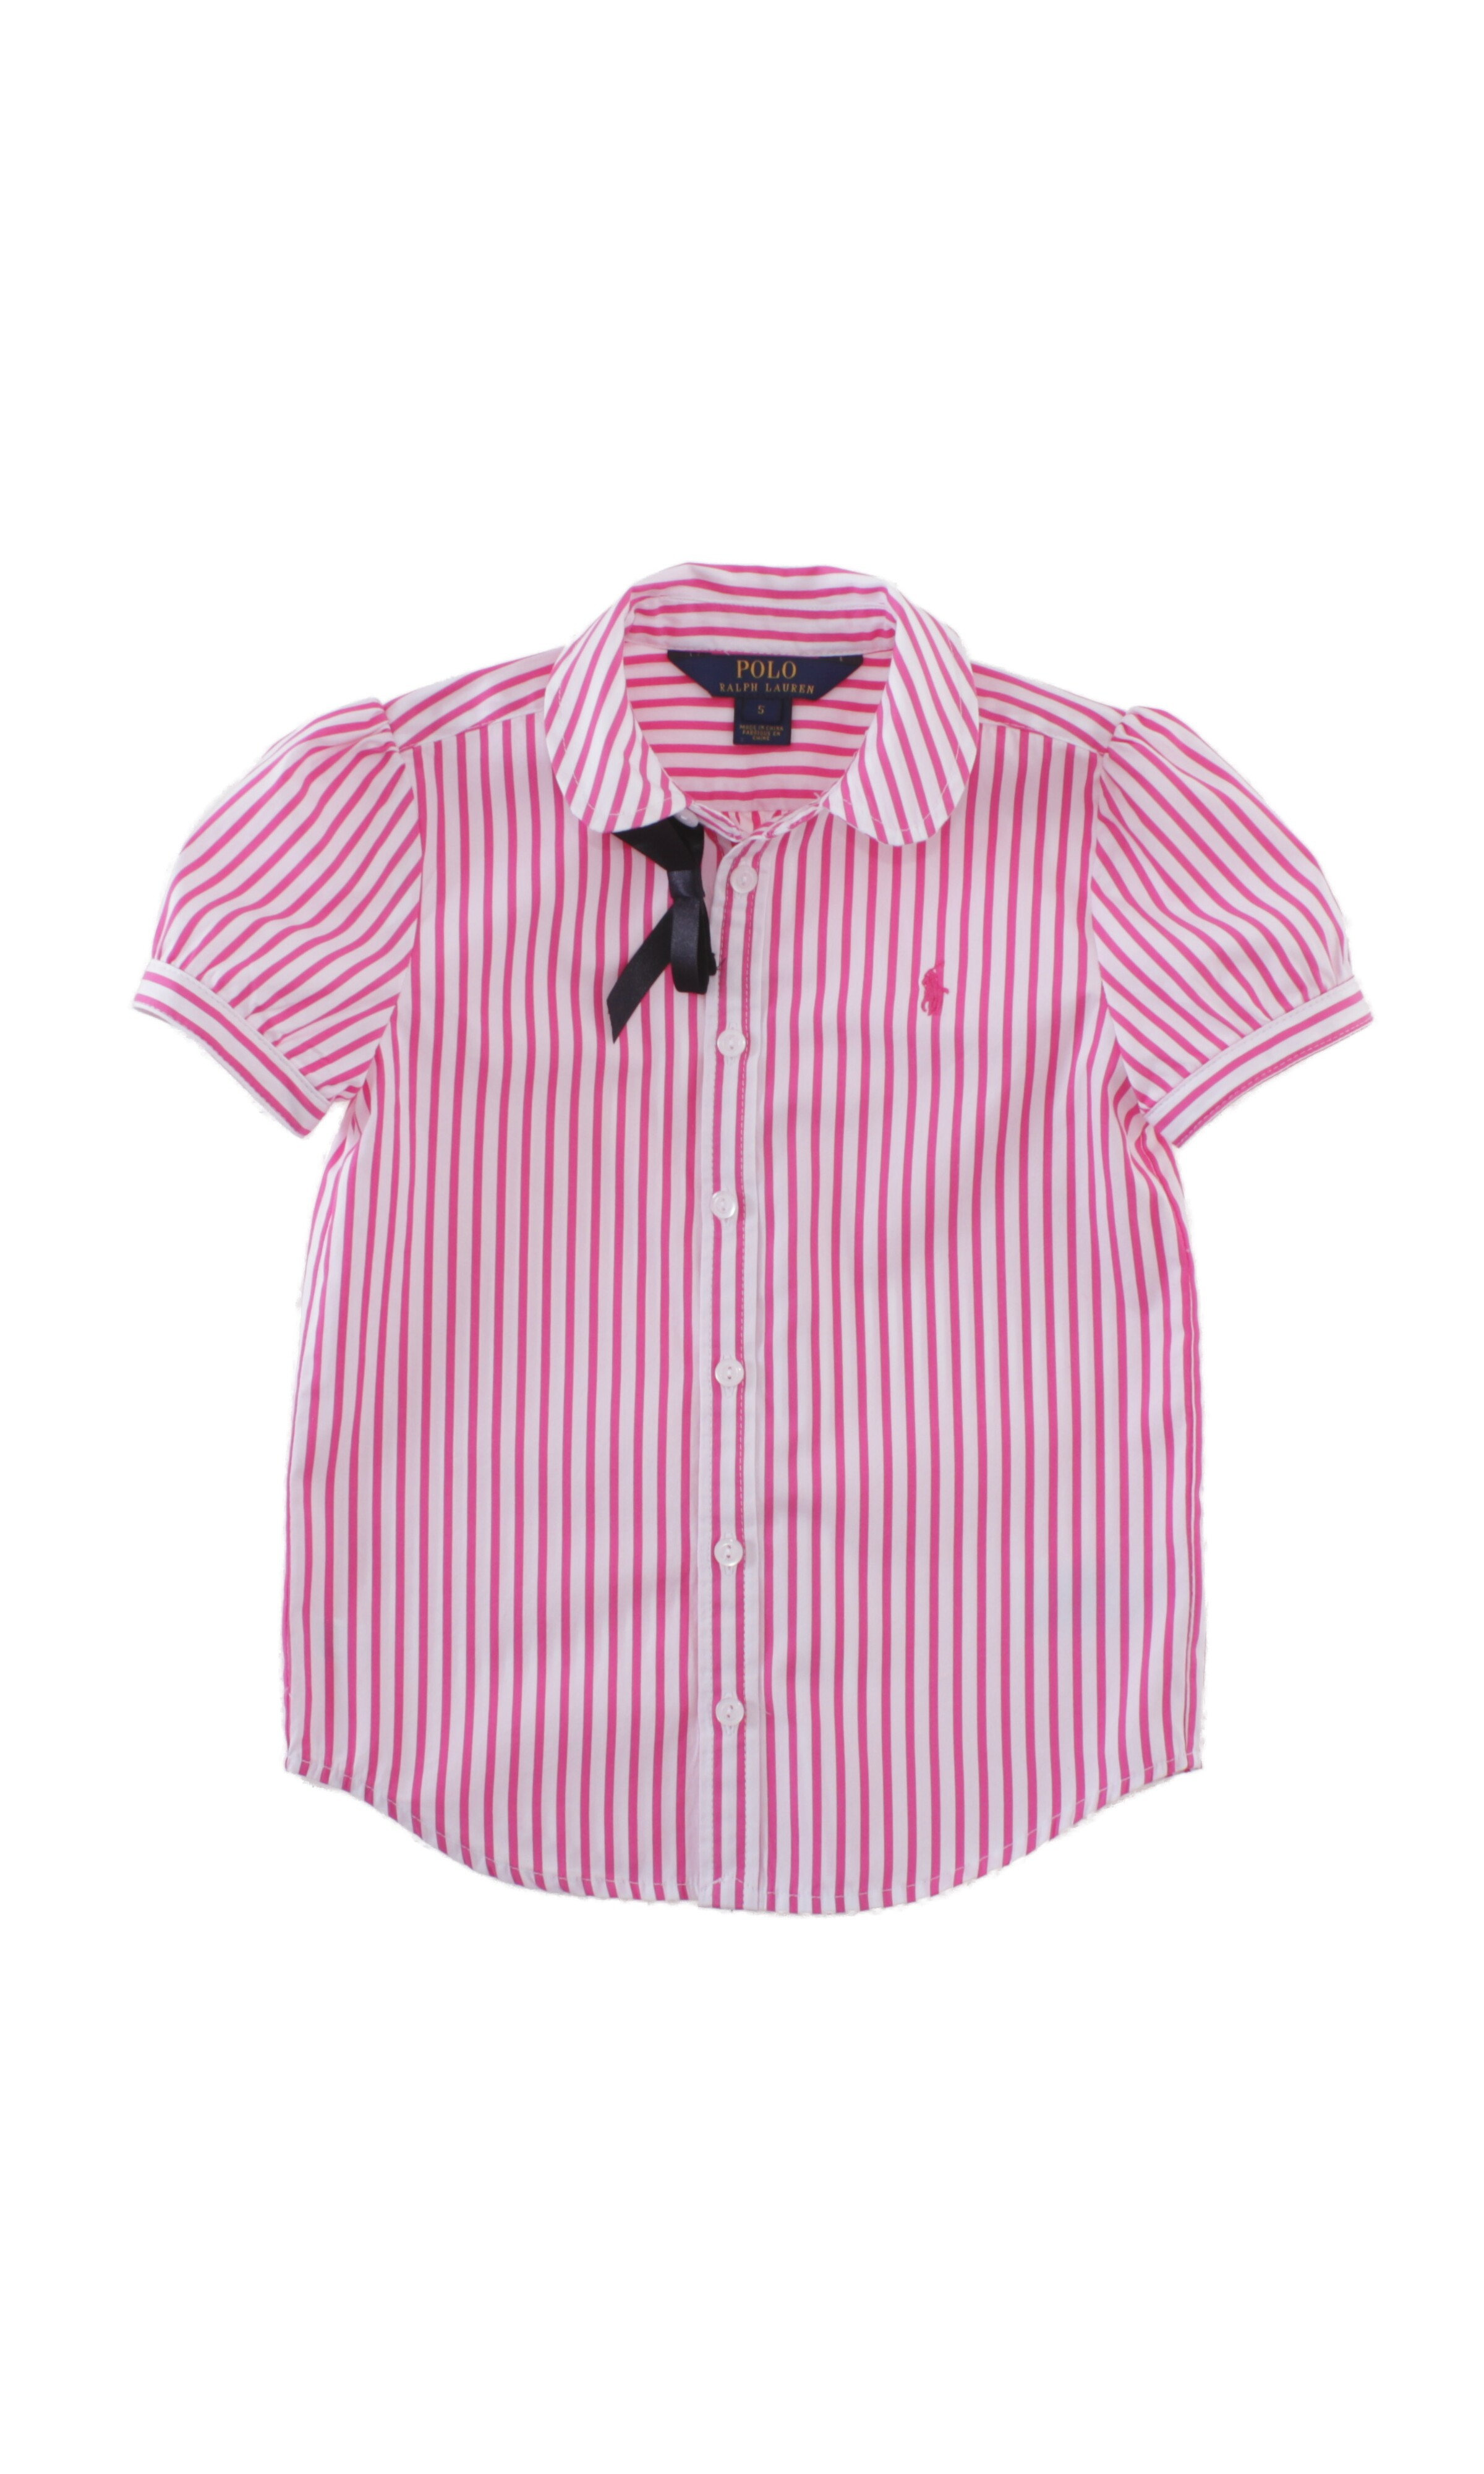 Striped T Shirt | eBay